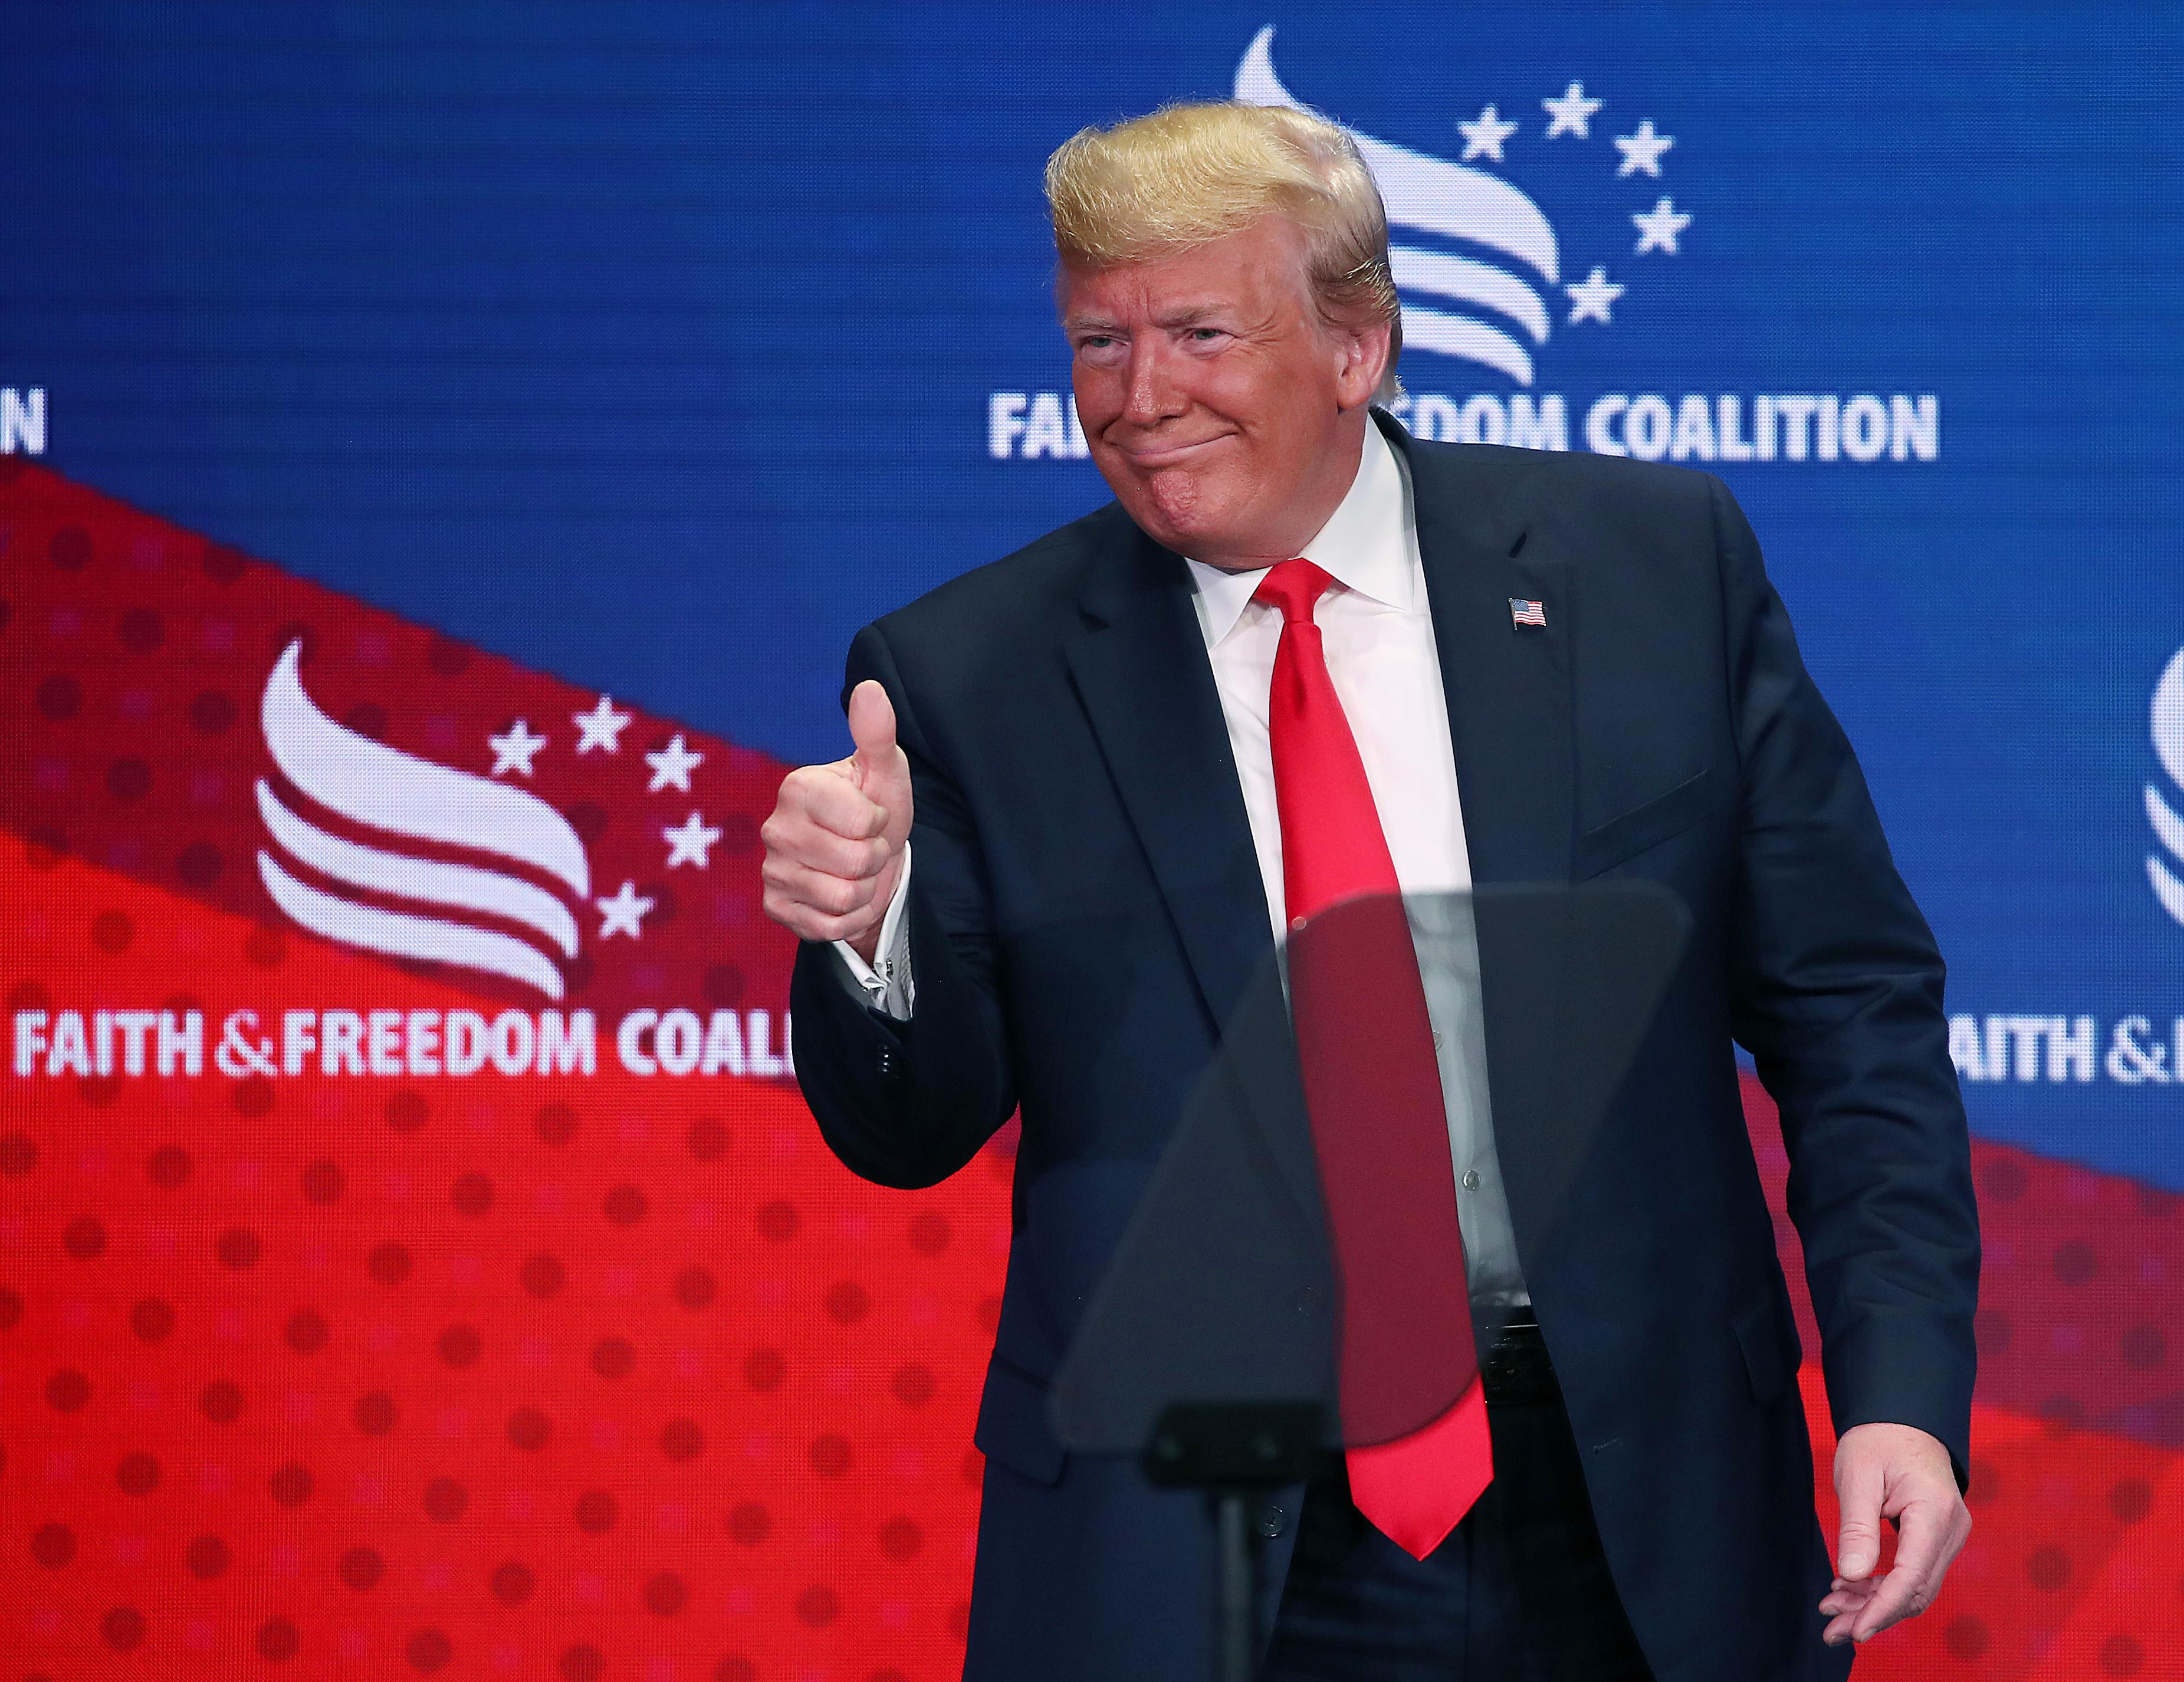 President Trump Addresses Faith & Freedom Coalition Conference In Washington